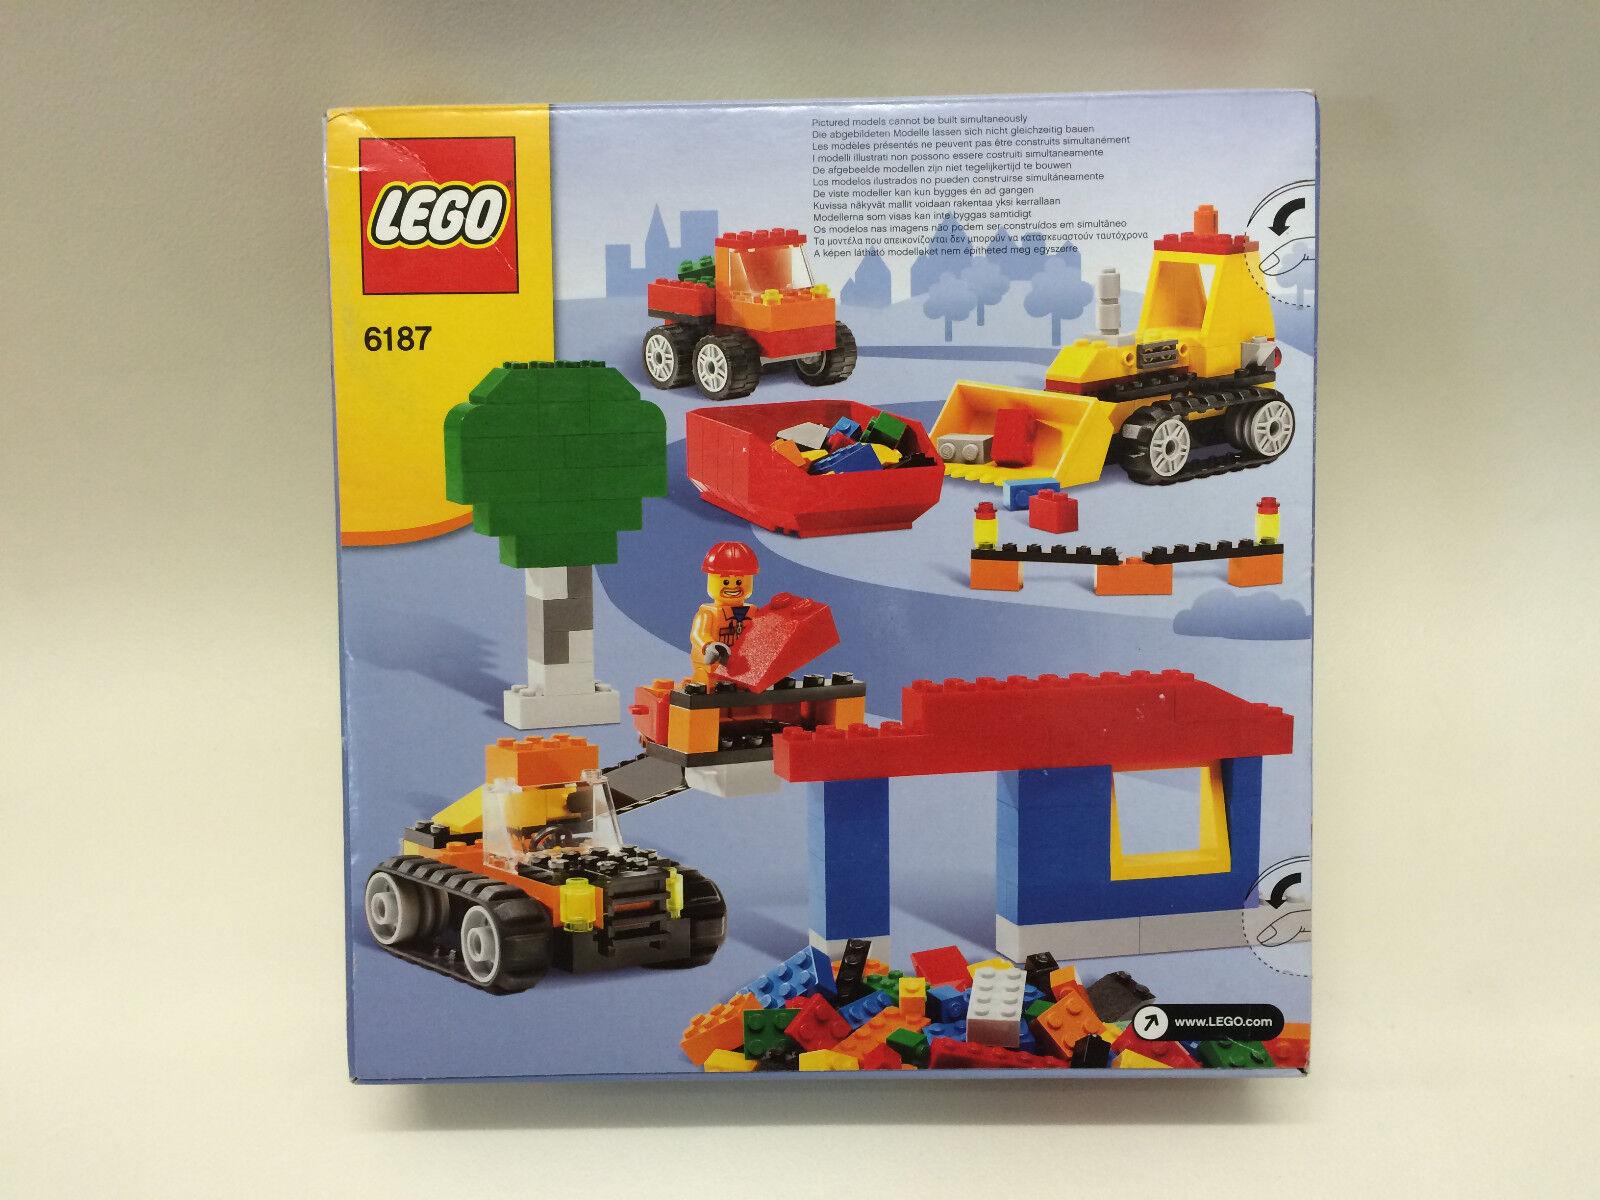 Neuf Scellé Scellé Scellé LEGO Creative Building 6187 lego construction routière interrompu RARE cee3d7